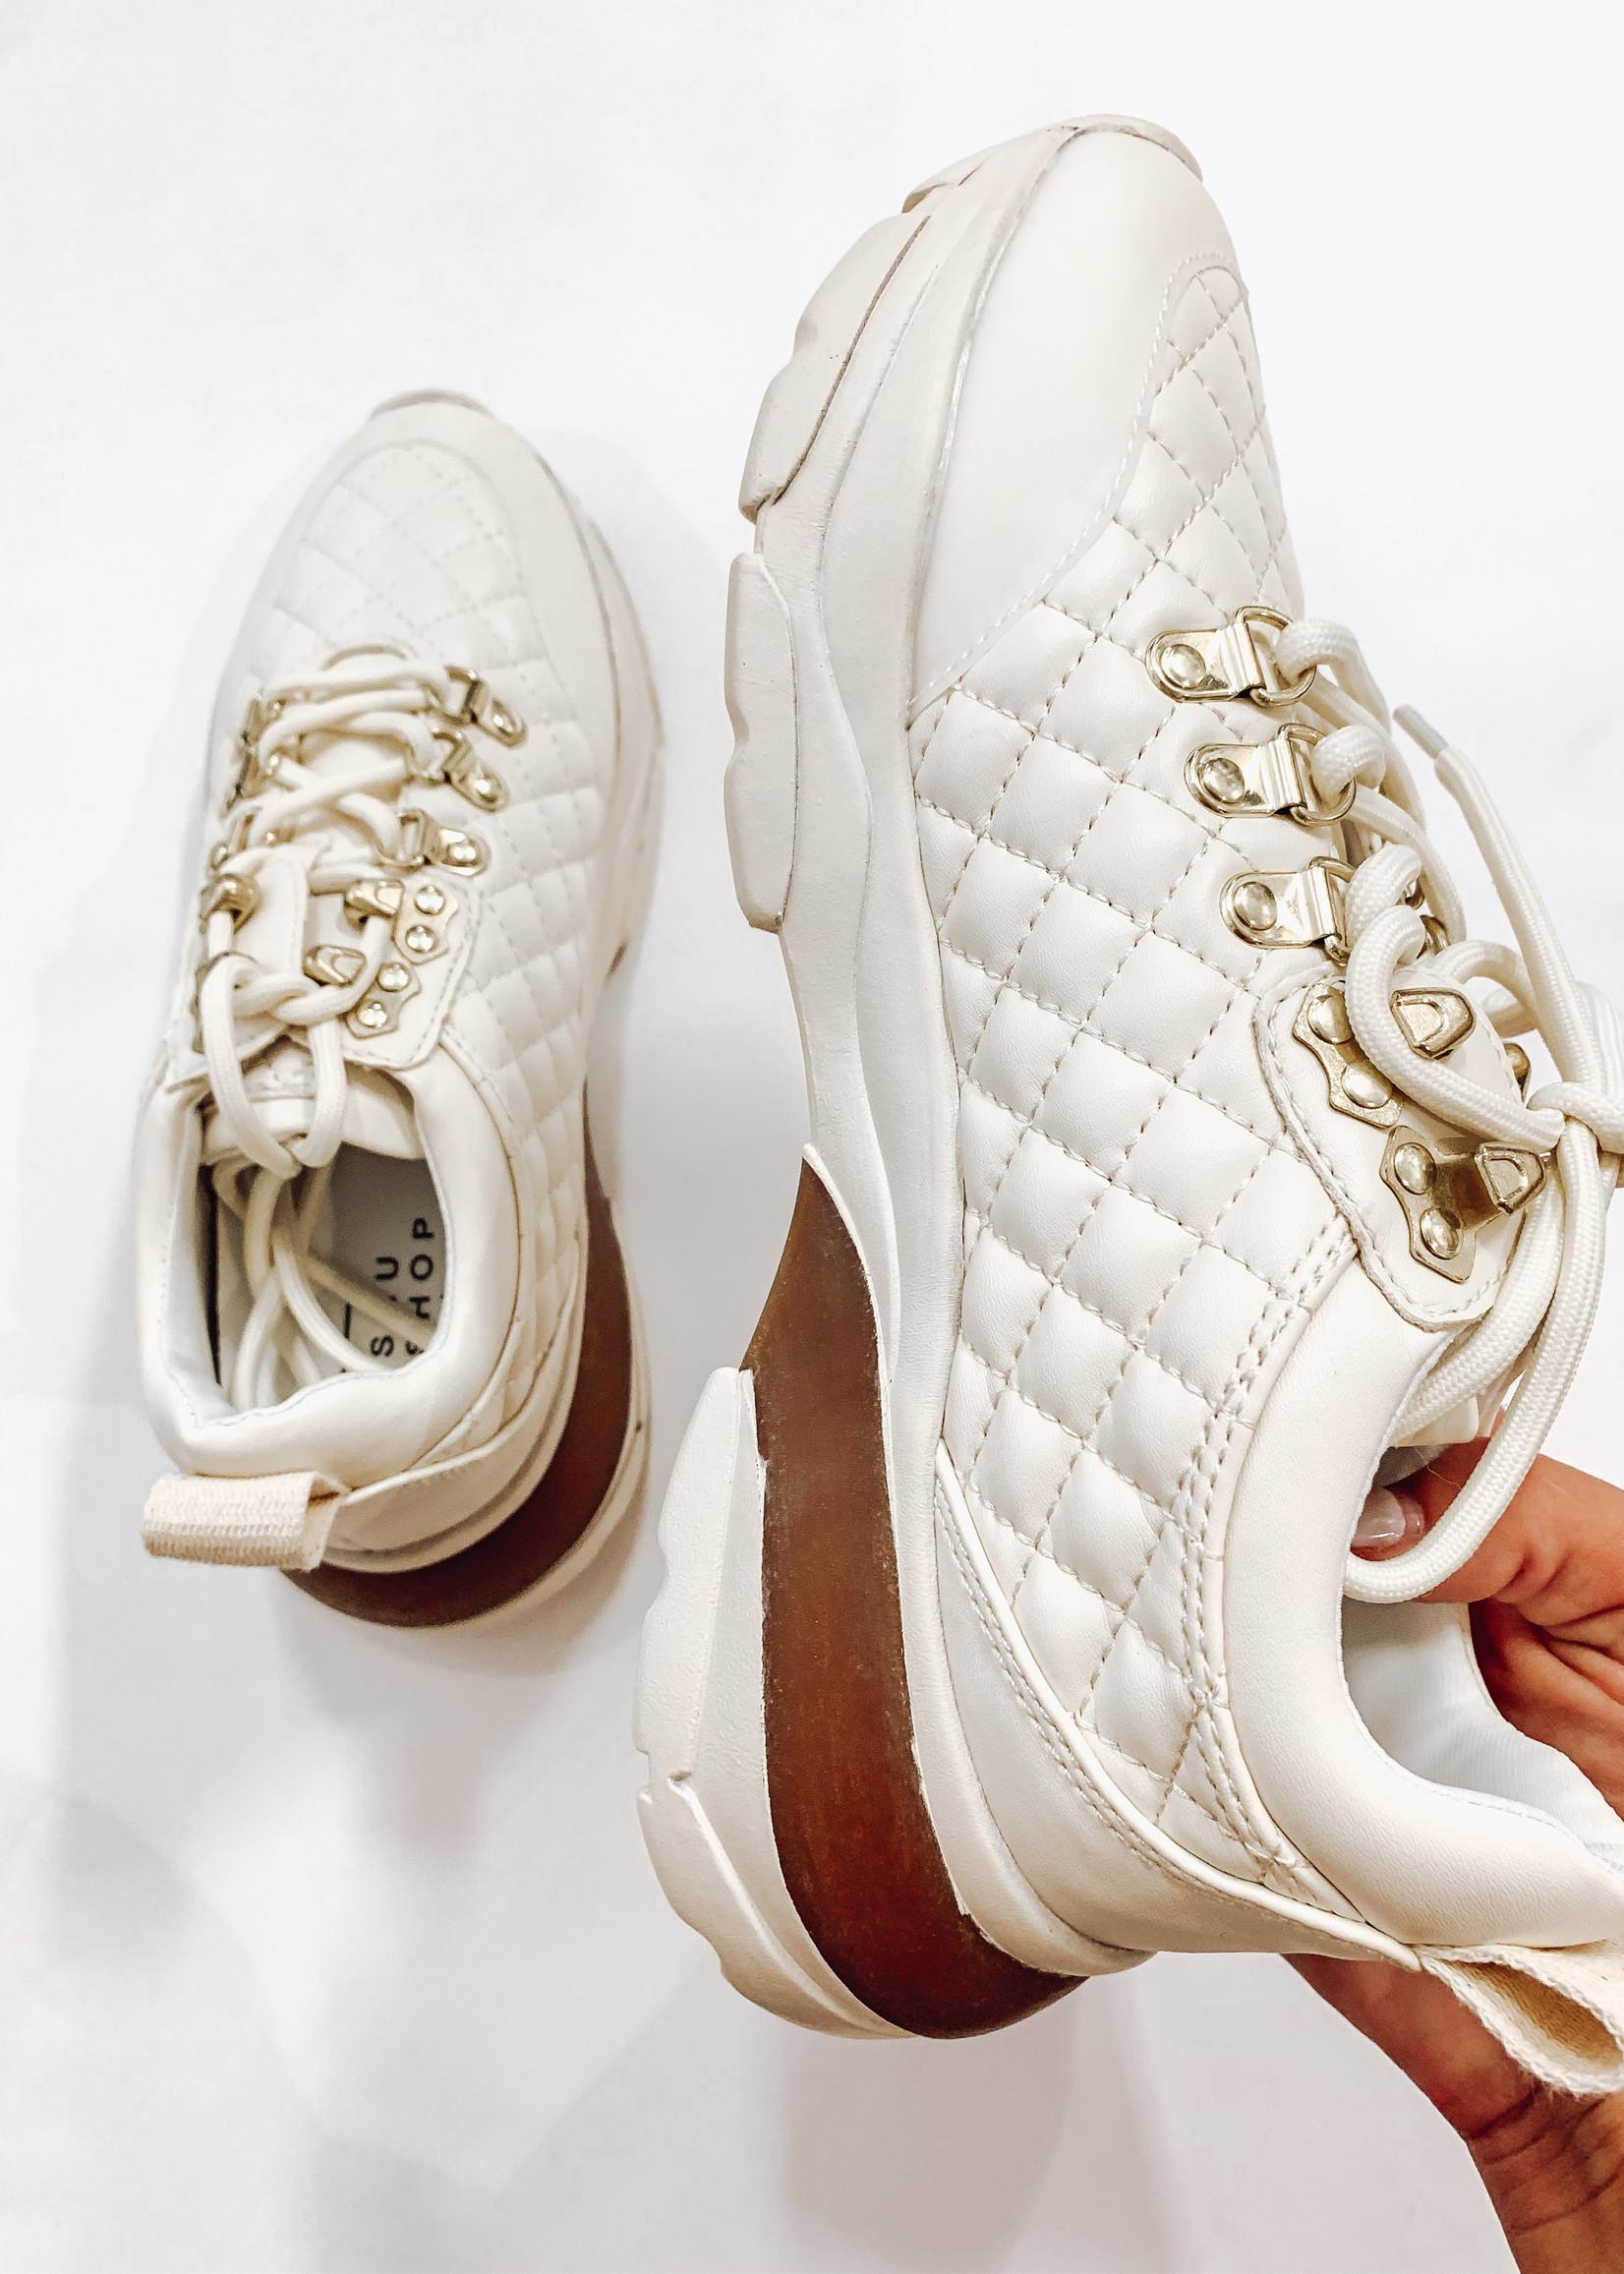 The Savannah Sneaker